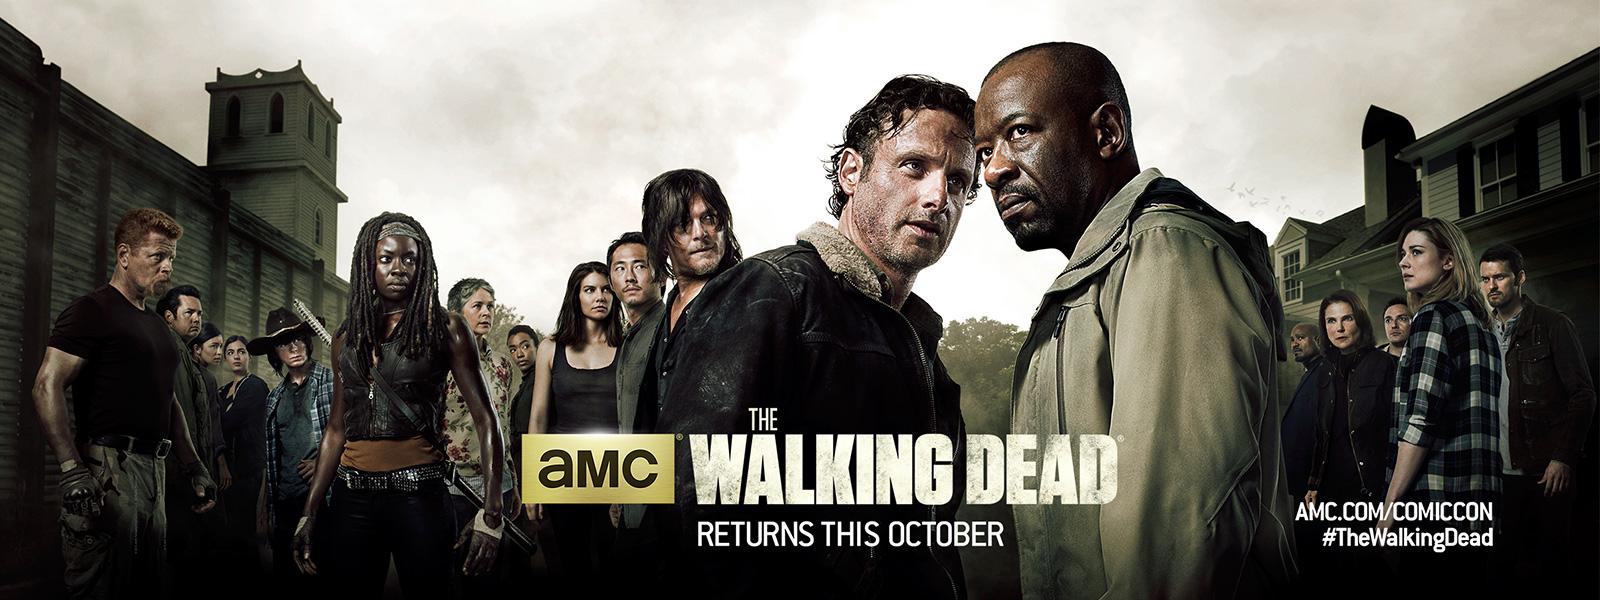 Xác Sống Phần 6 - The Walking Dead Season 6 - 2015